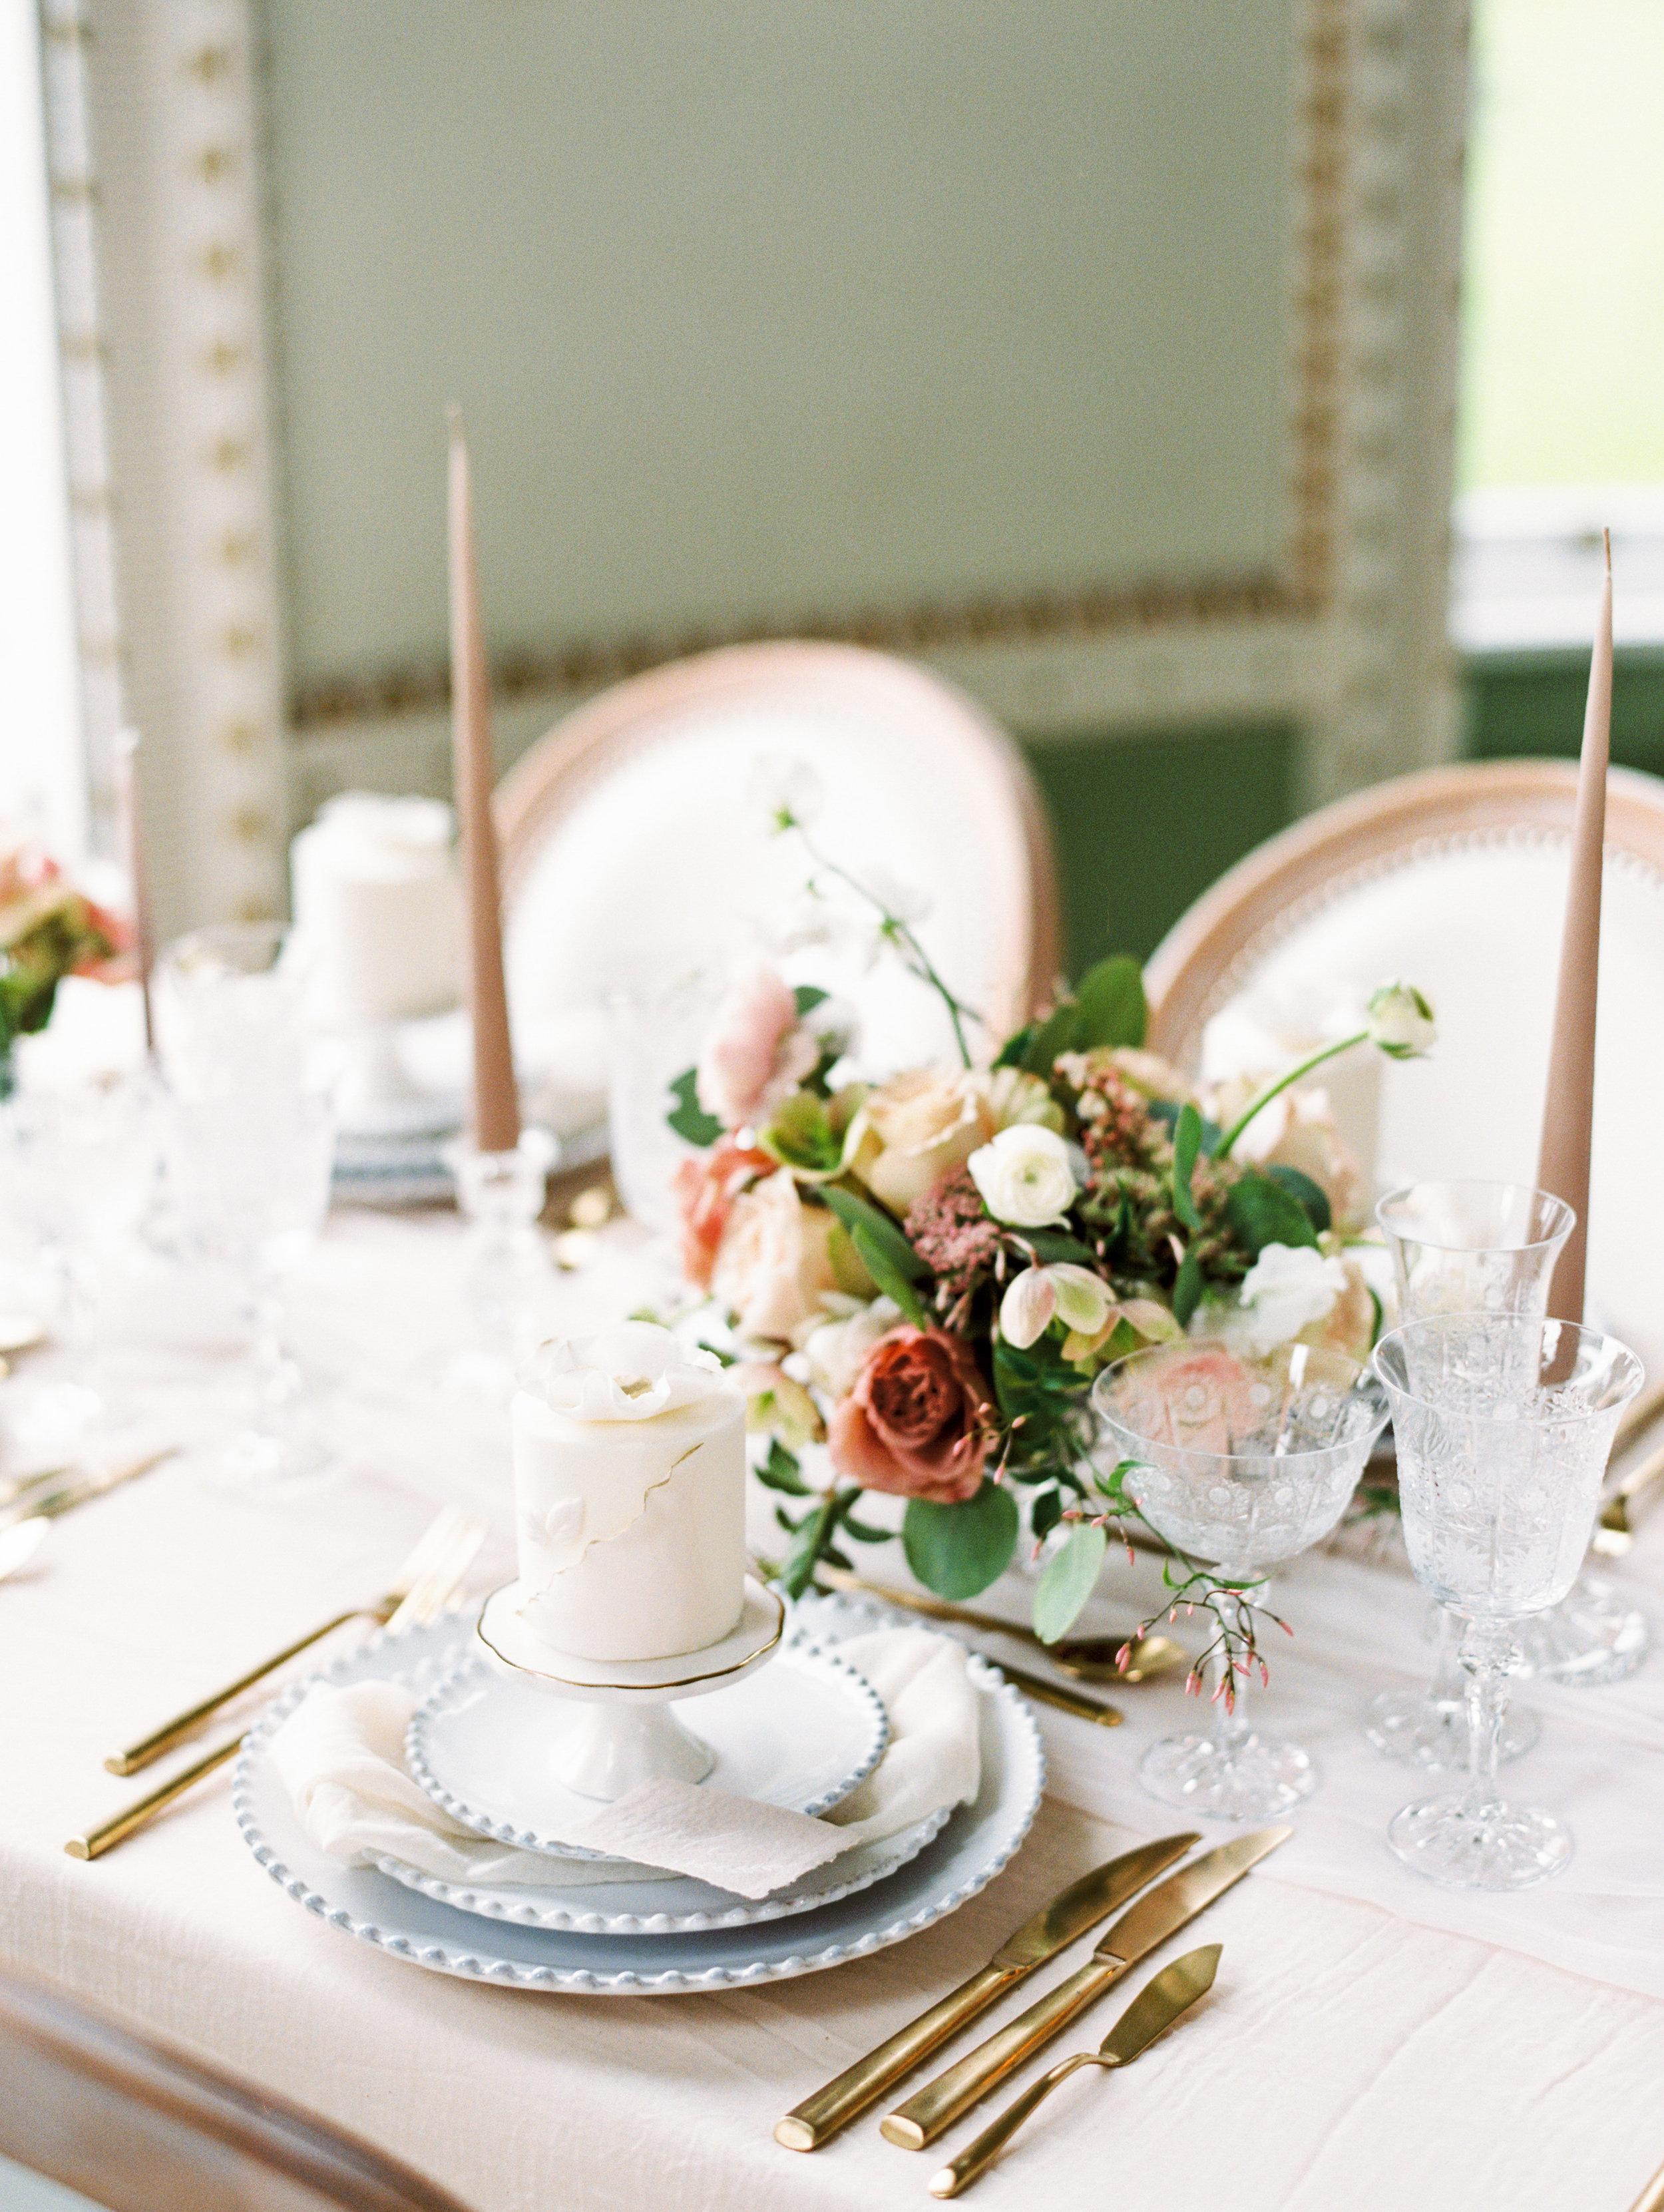 The Timeless Stylist-Elegant and Romantic Wedding Styling-Fine Art Tablescape.jpg